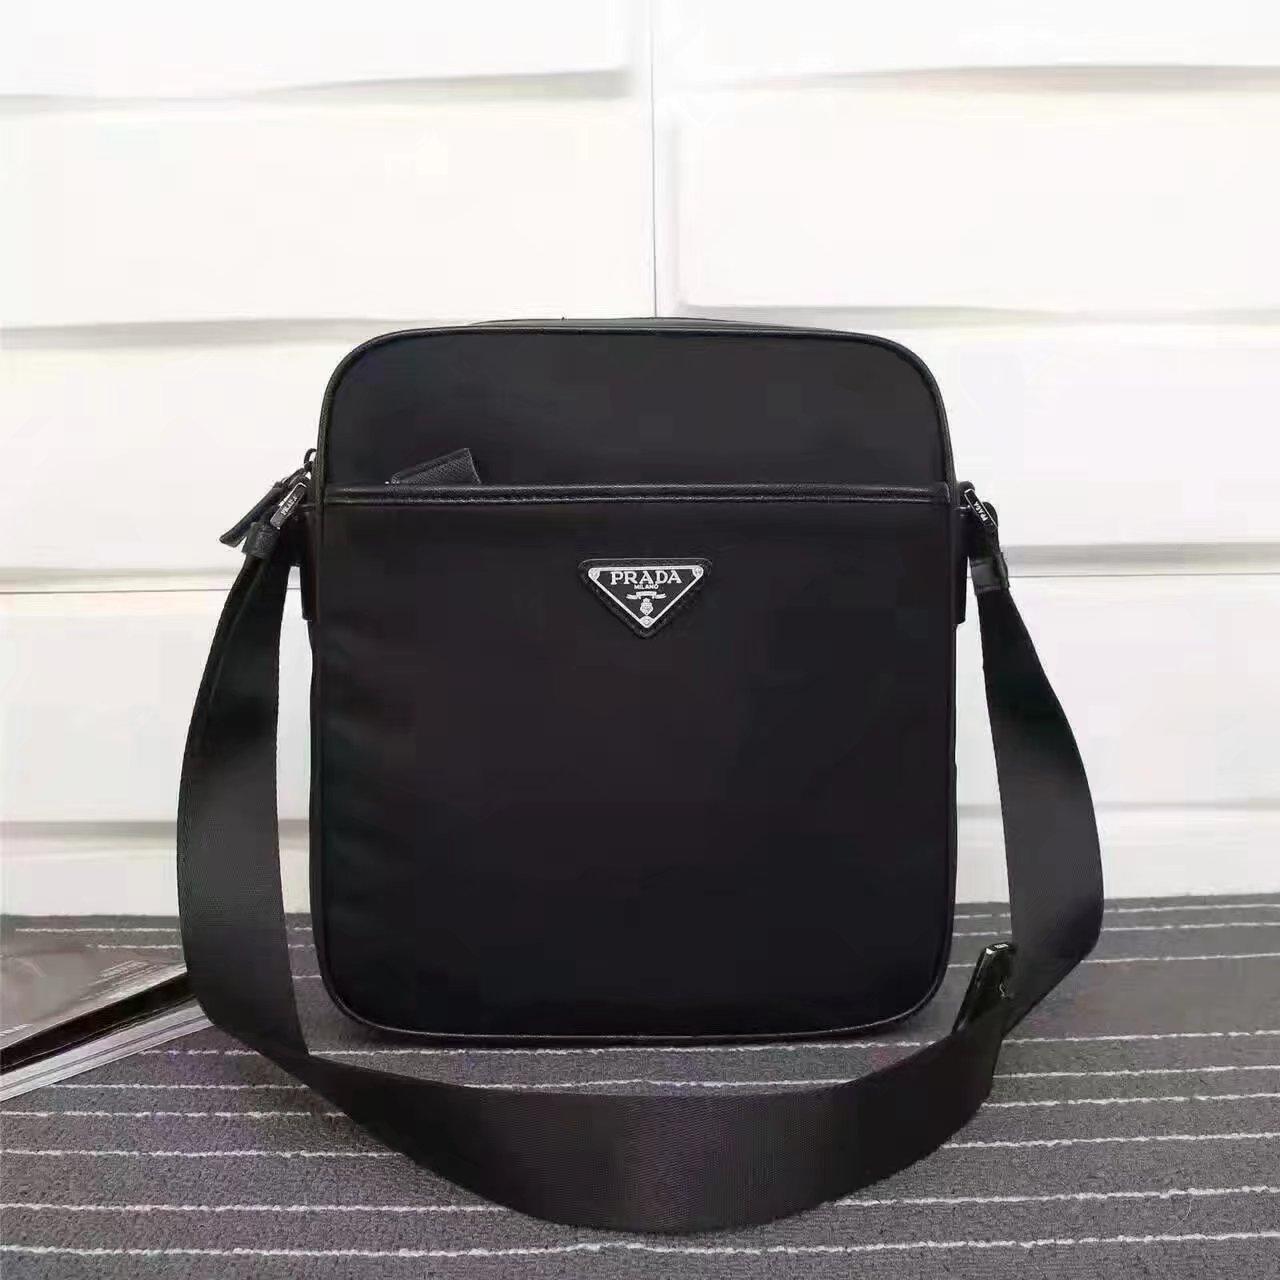 Prada 2VA002 Men Messenger Bag Black